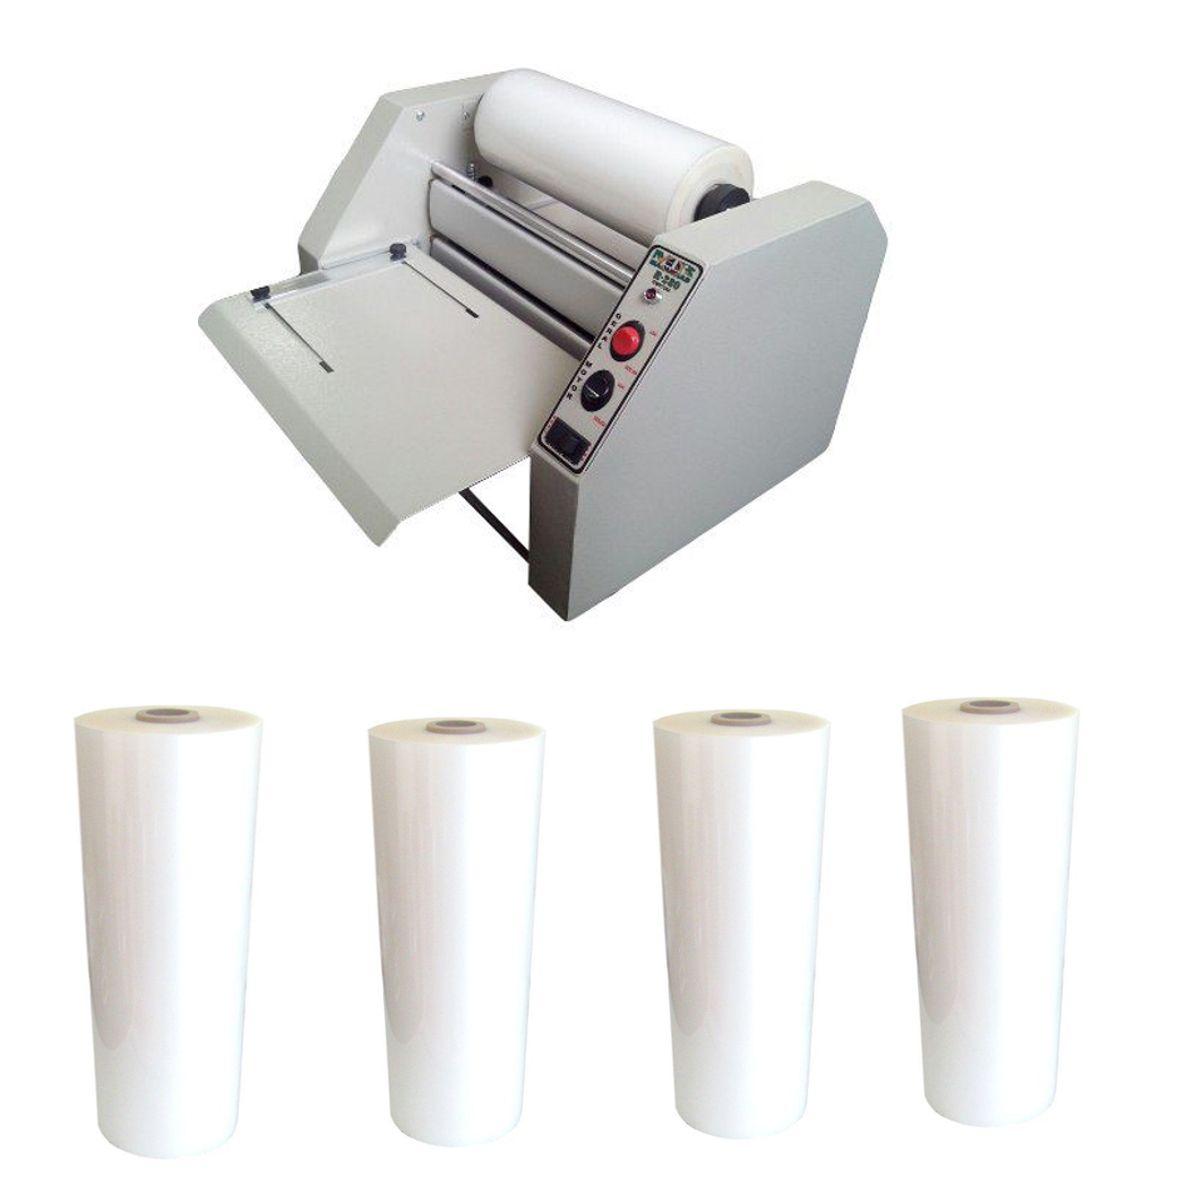 Kit Plastificadora R-280 + 4 Bobinas Polaseal (A4/Ofício)